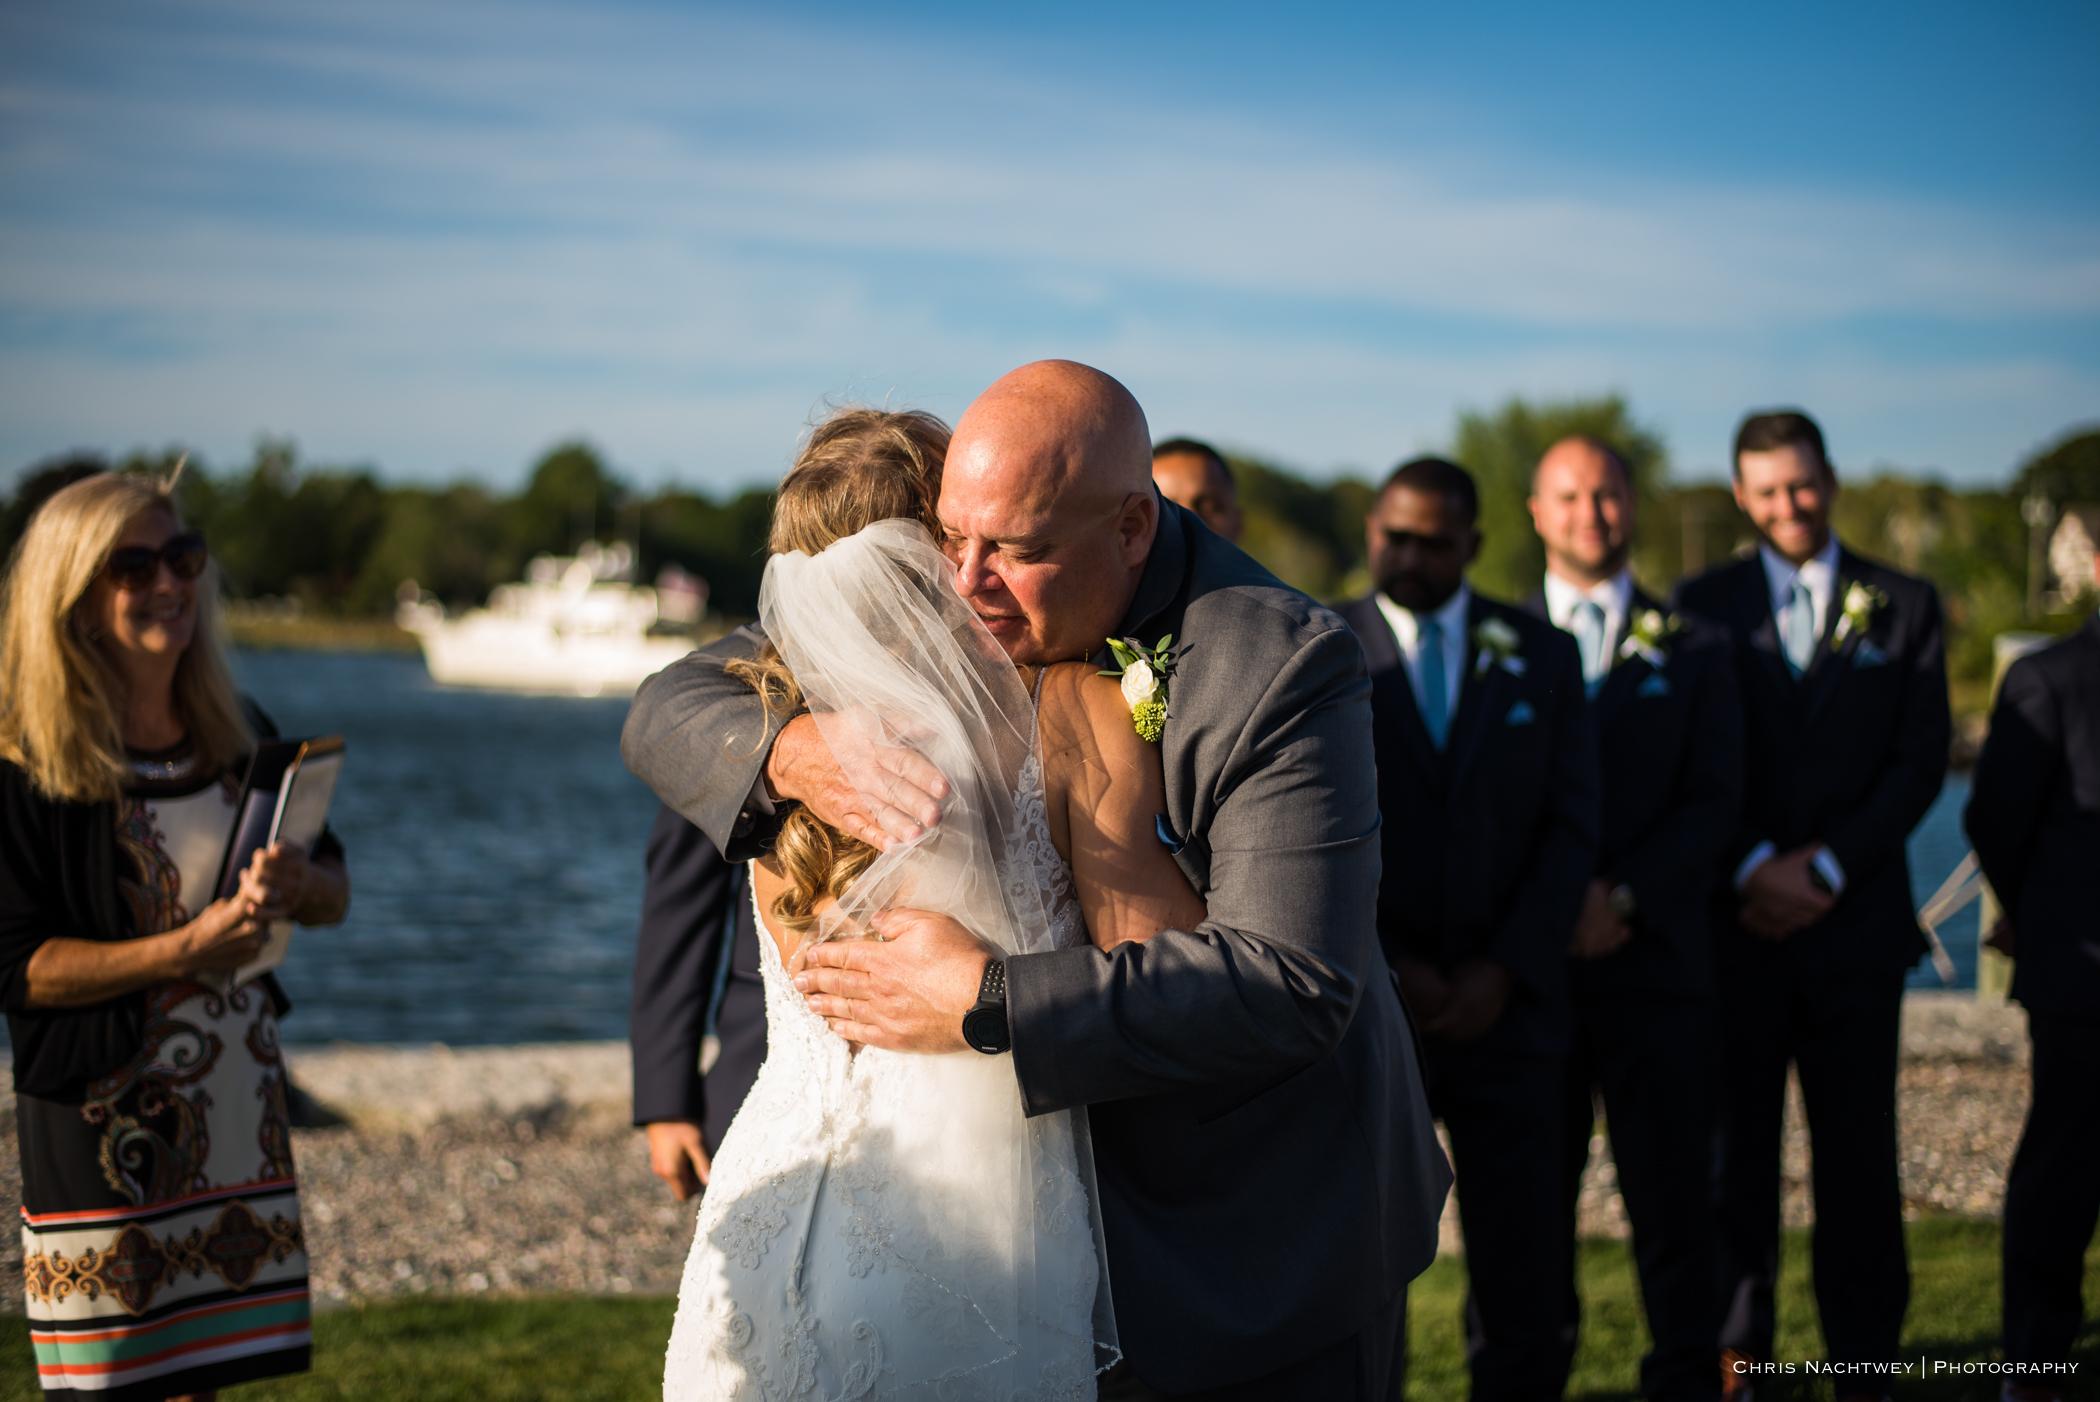 mystic-ct-artistic-wedding-photographers-chris-nachtwey-tany-mike-2017-33.jpg